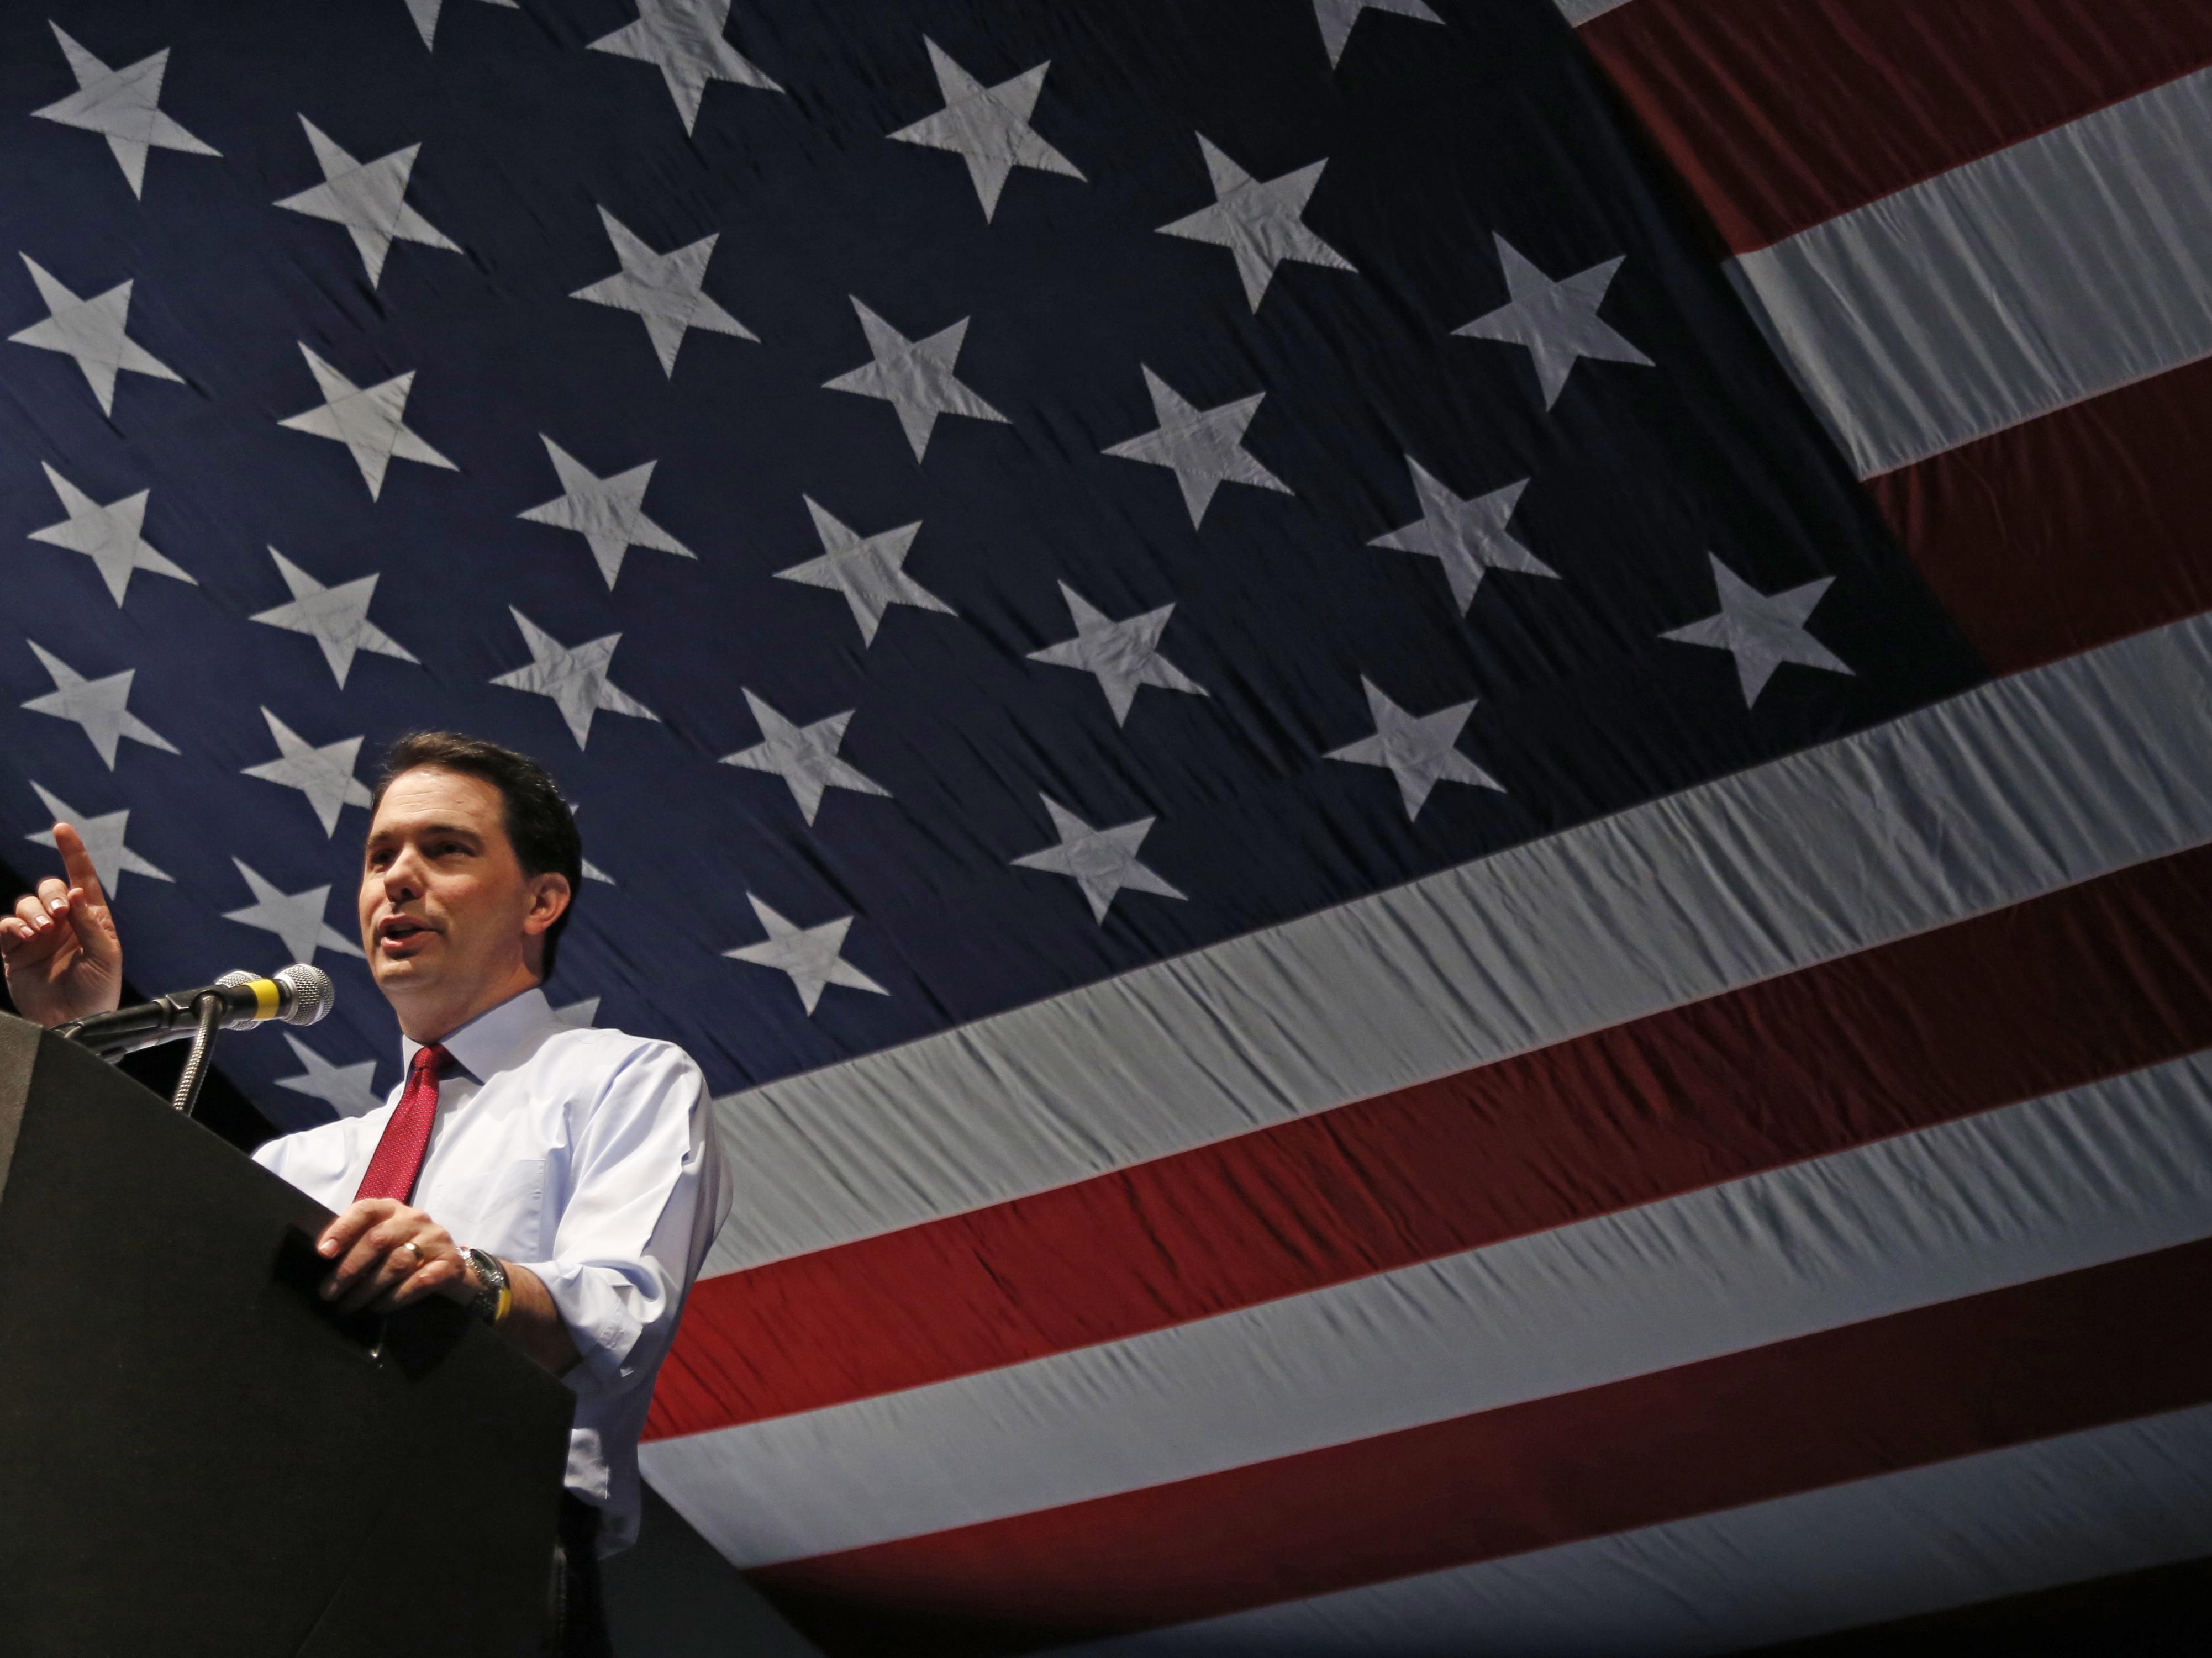 Wisconsin Republican Convention